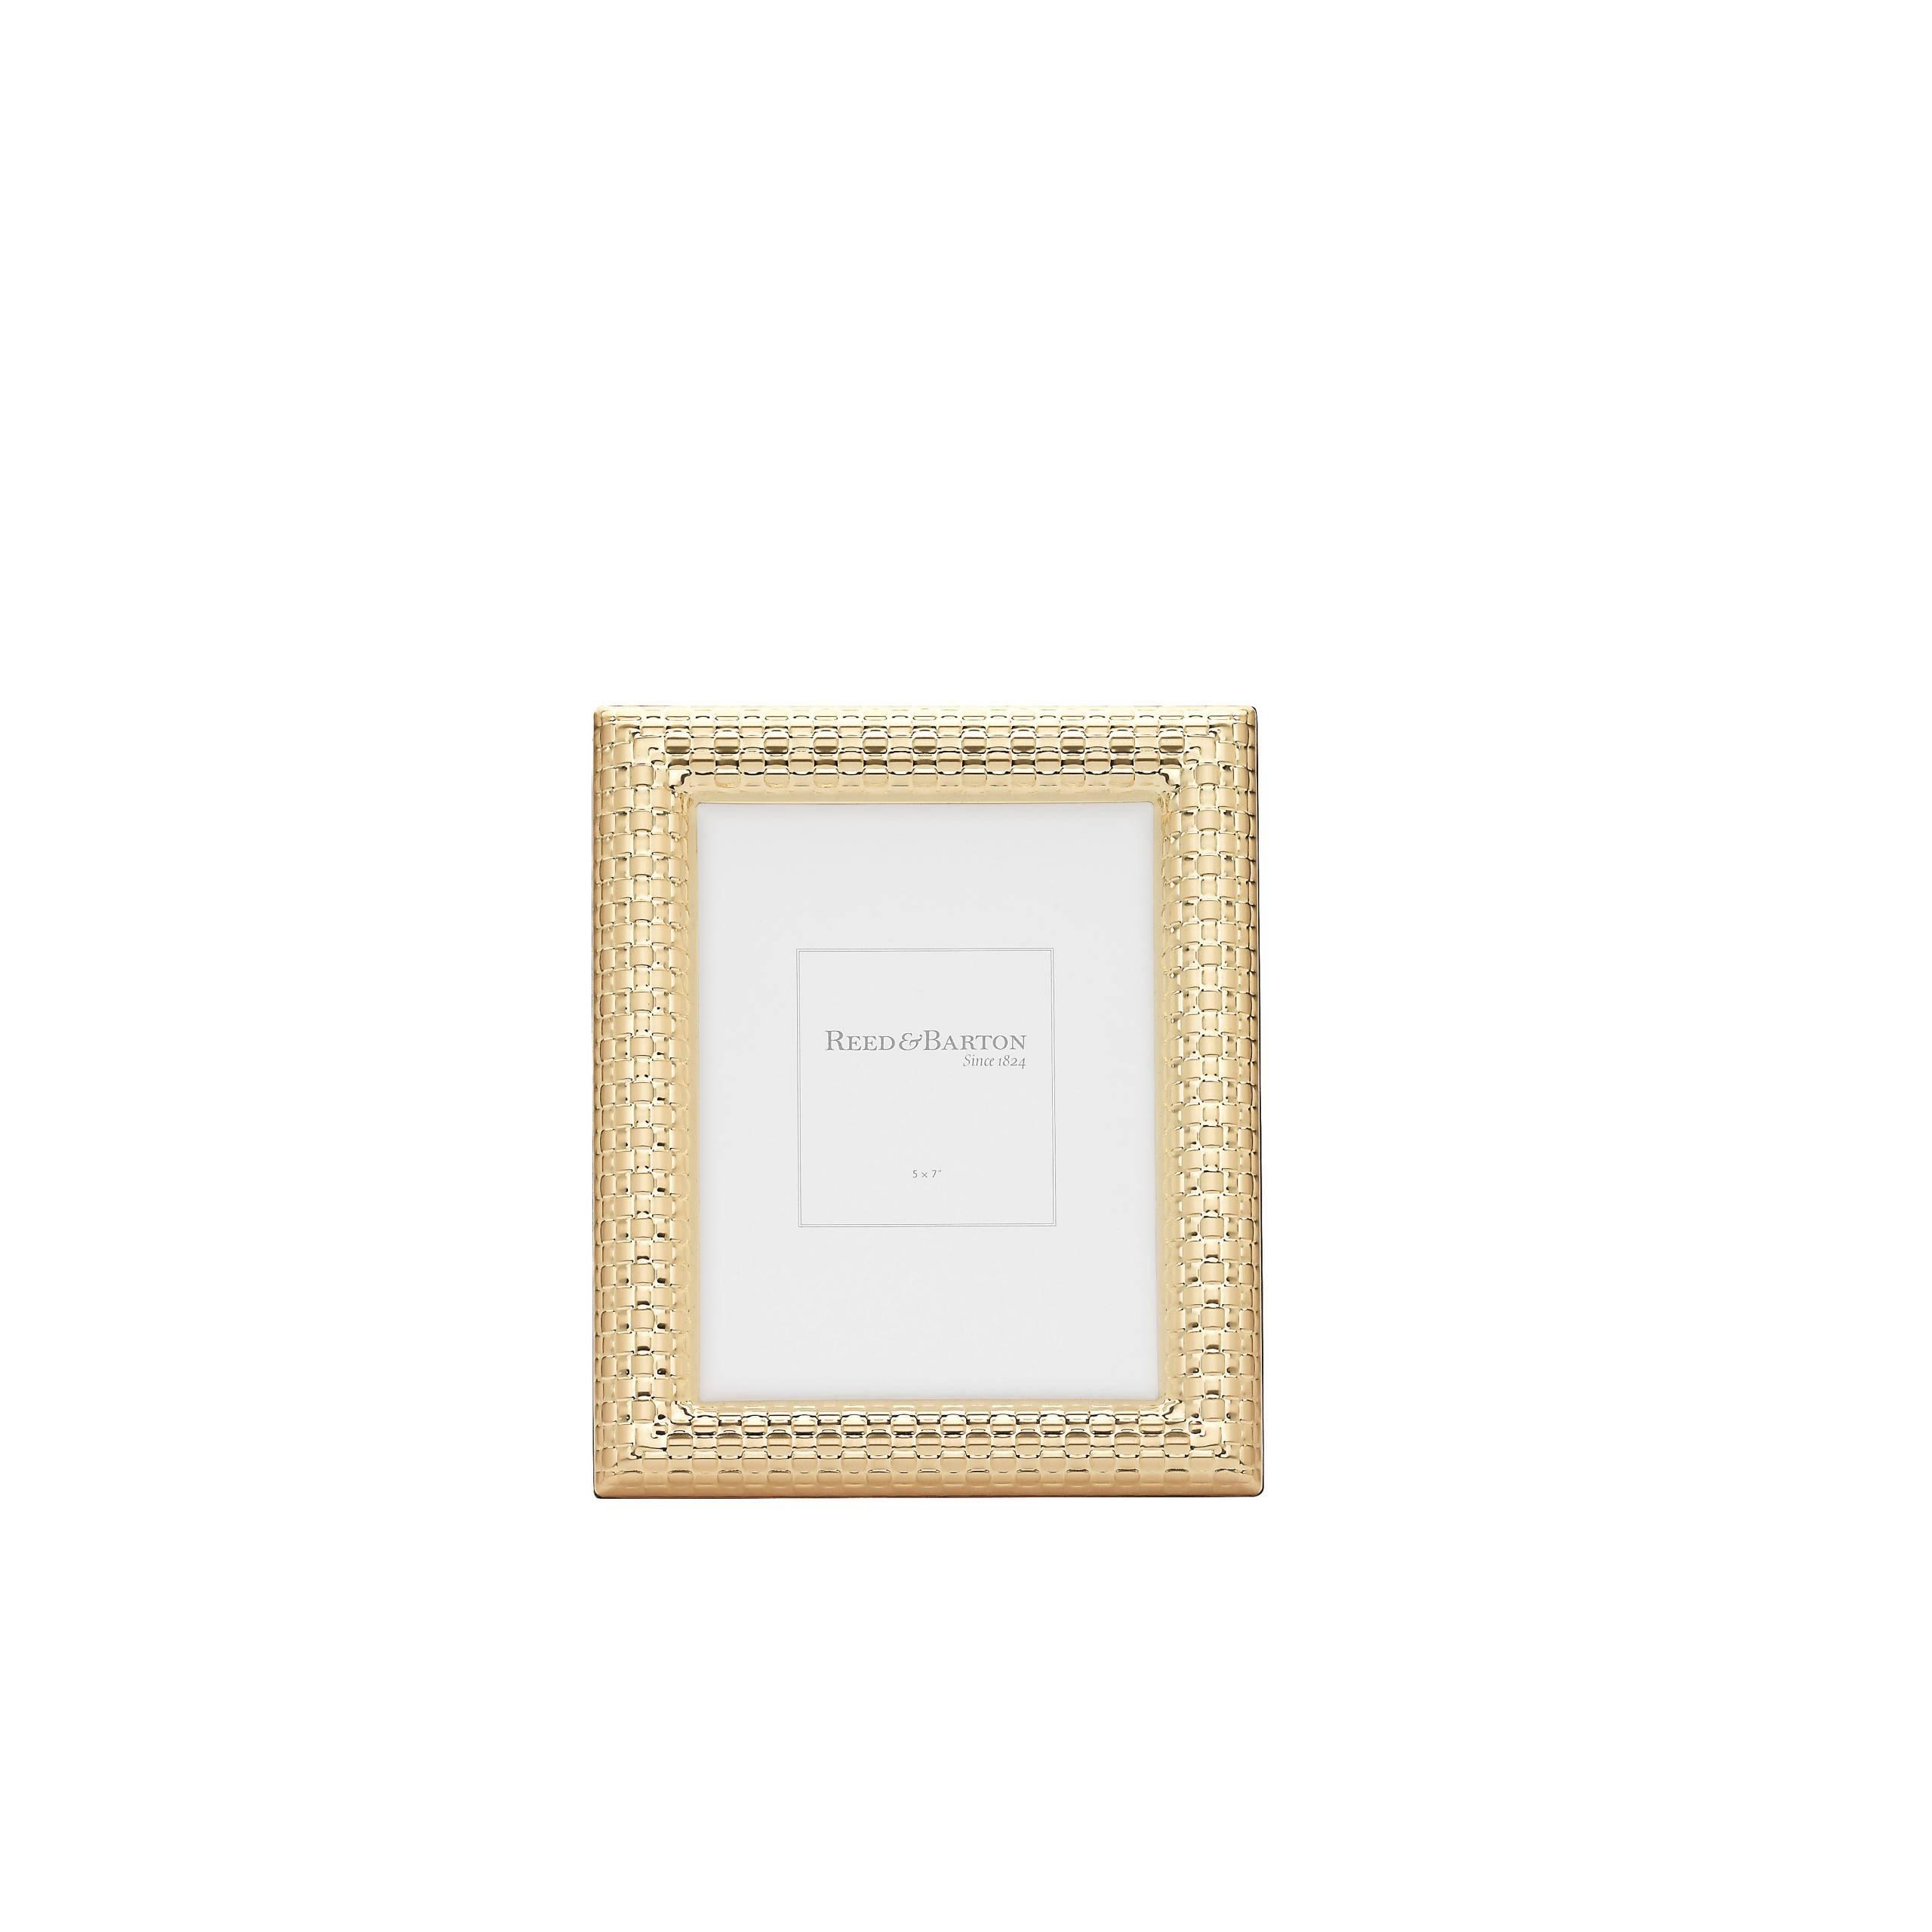 Reed & Barton Watchband Satin Gold Frame, 5'' X 7''